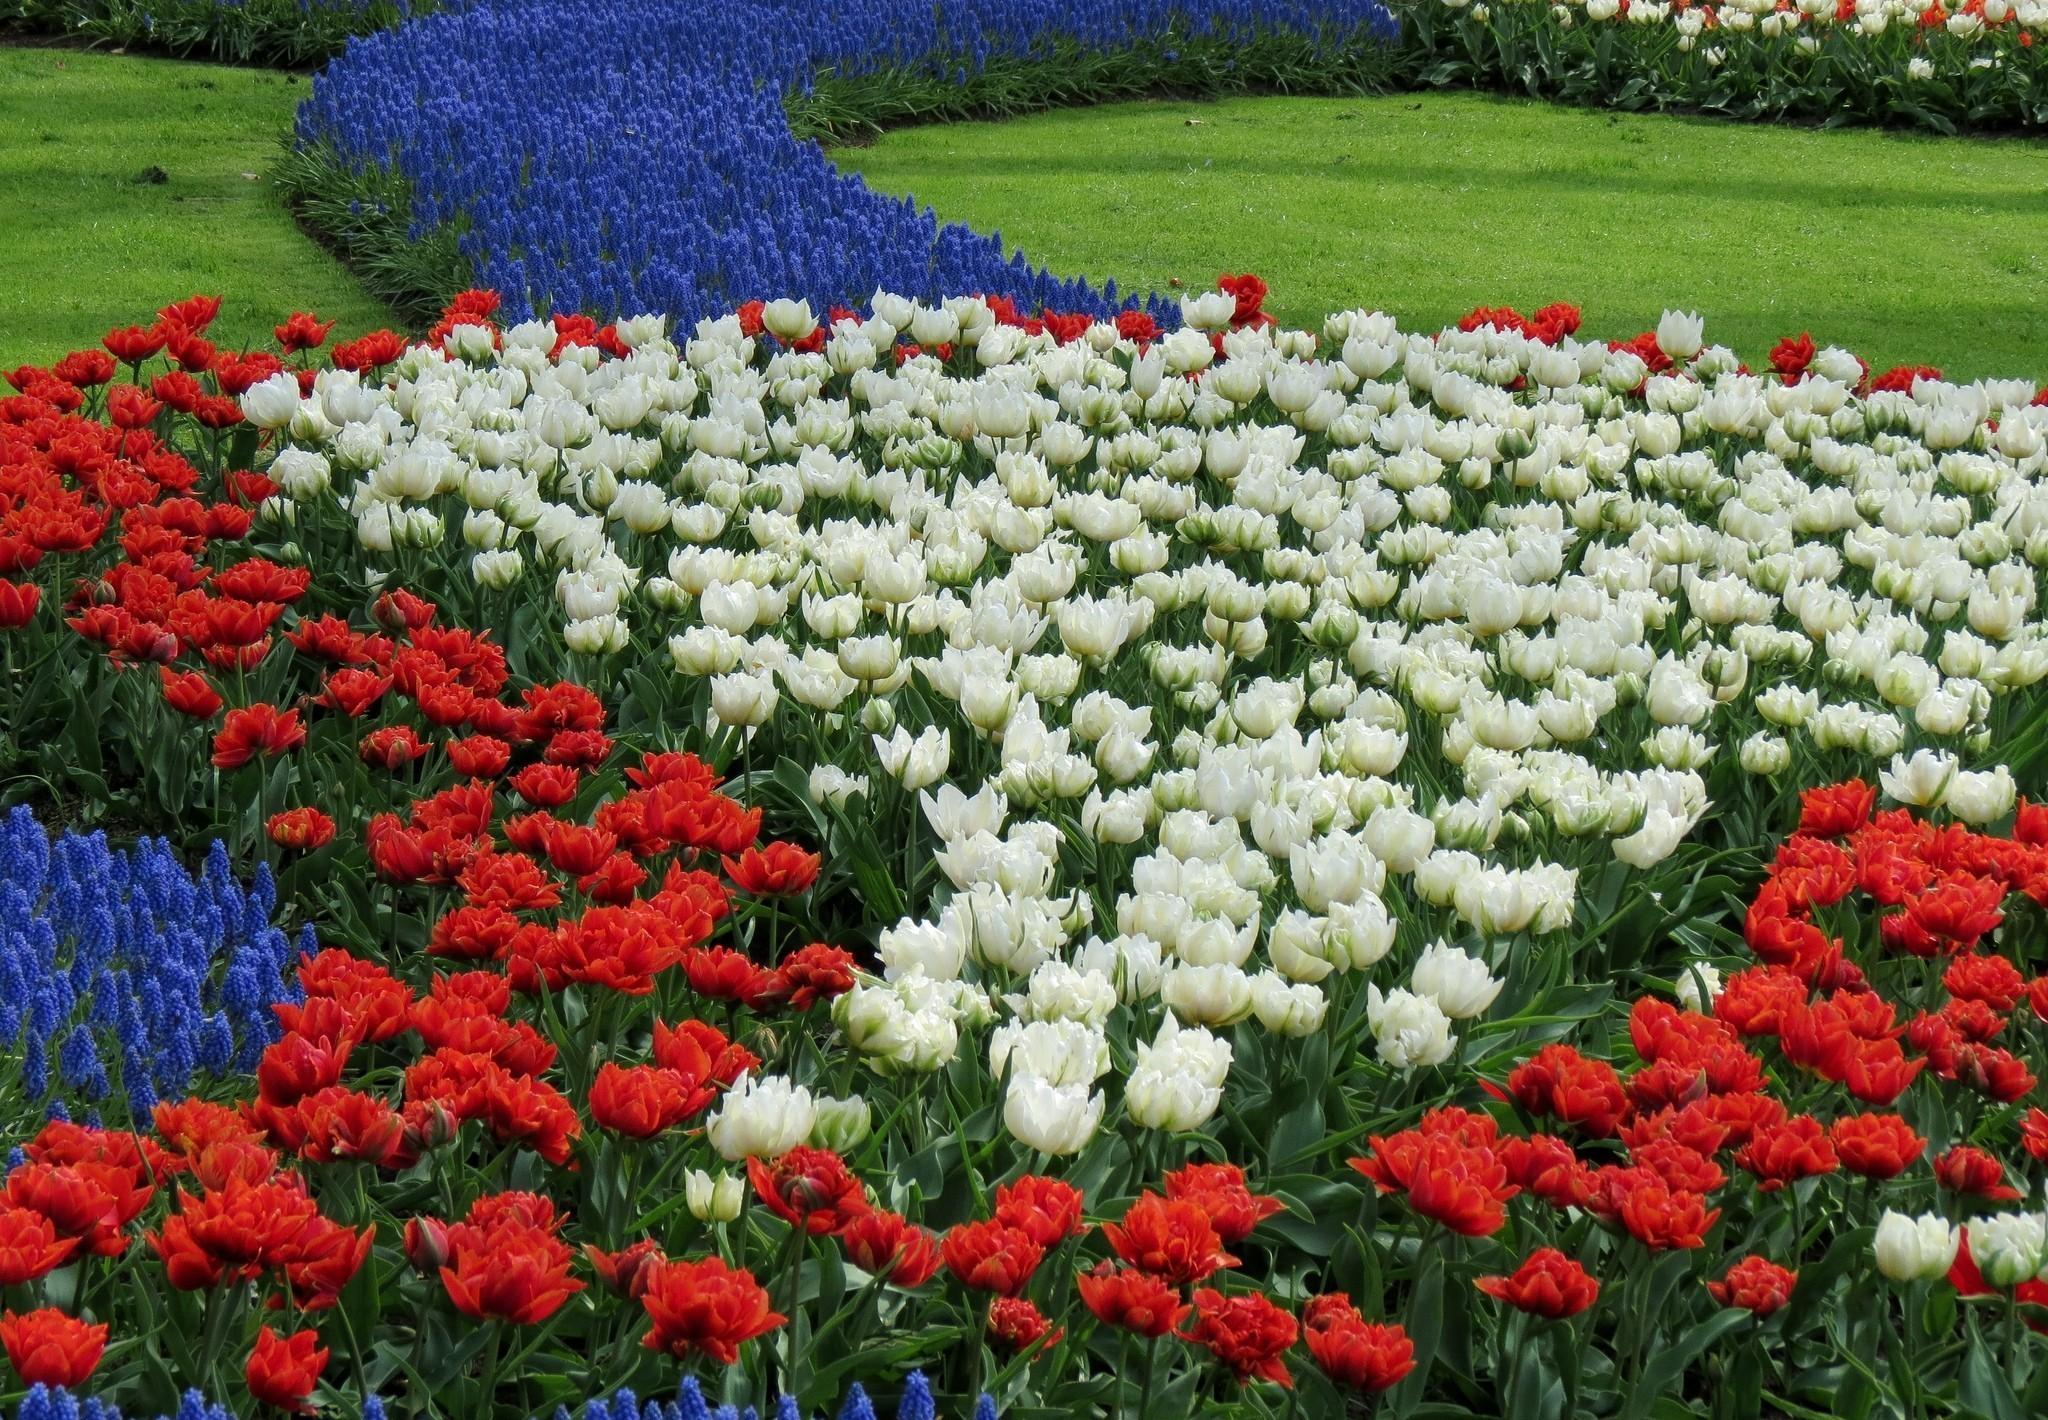 153159 descargar fondo de pantalla Flores, Muscari, Muskari, Cama De Flores, Parterre, Patrón, Tulipanes: protectores de pantalla e imágenes gratis